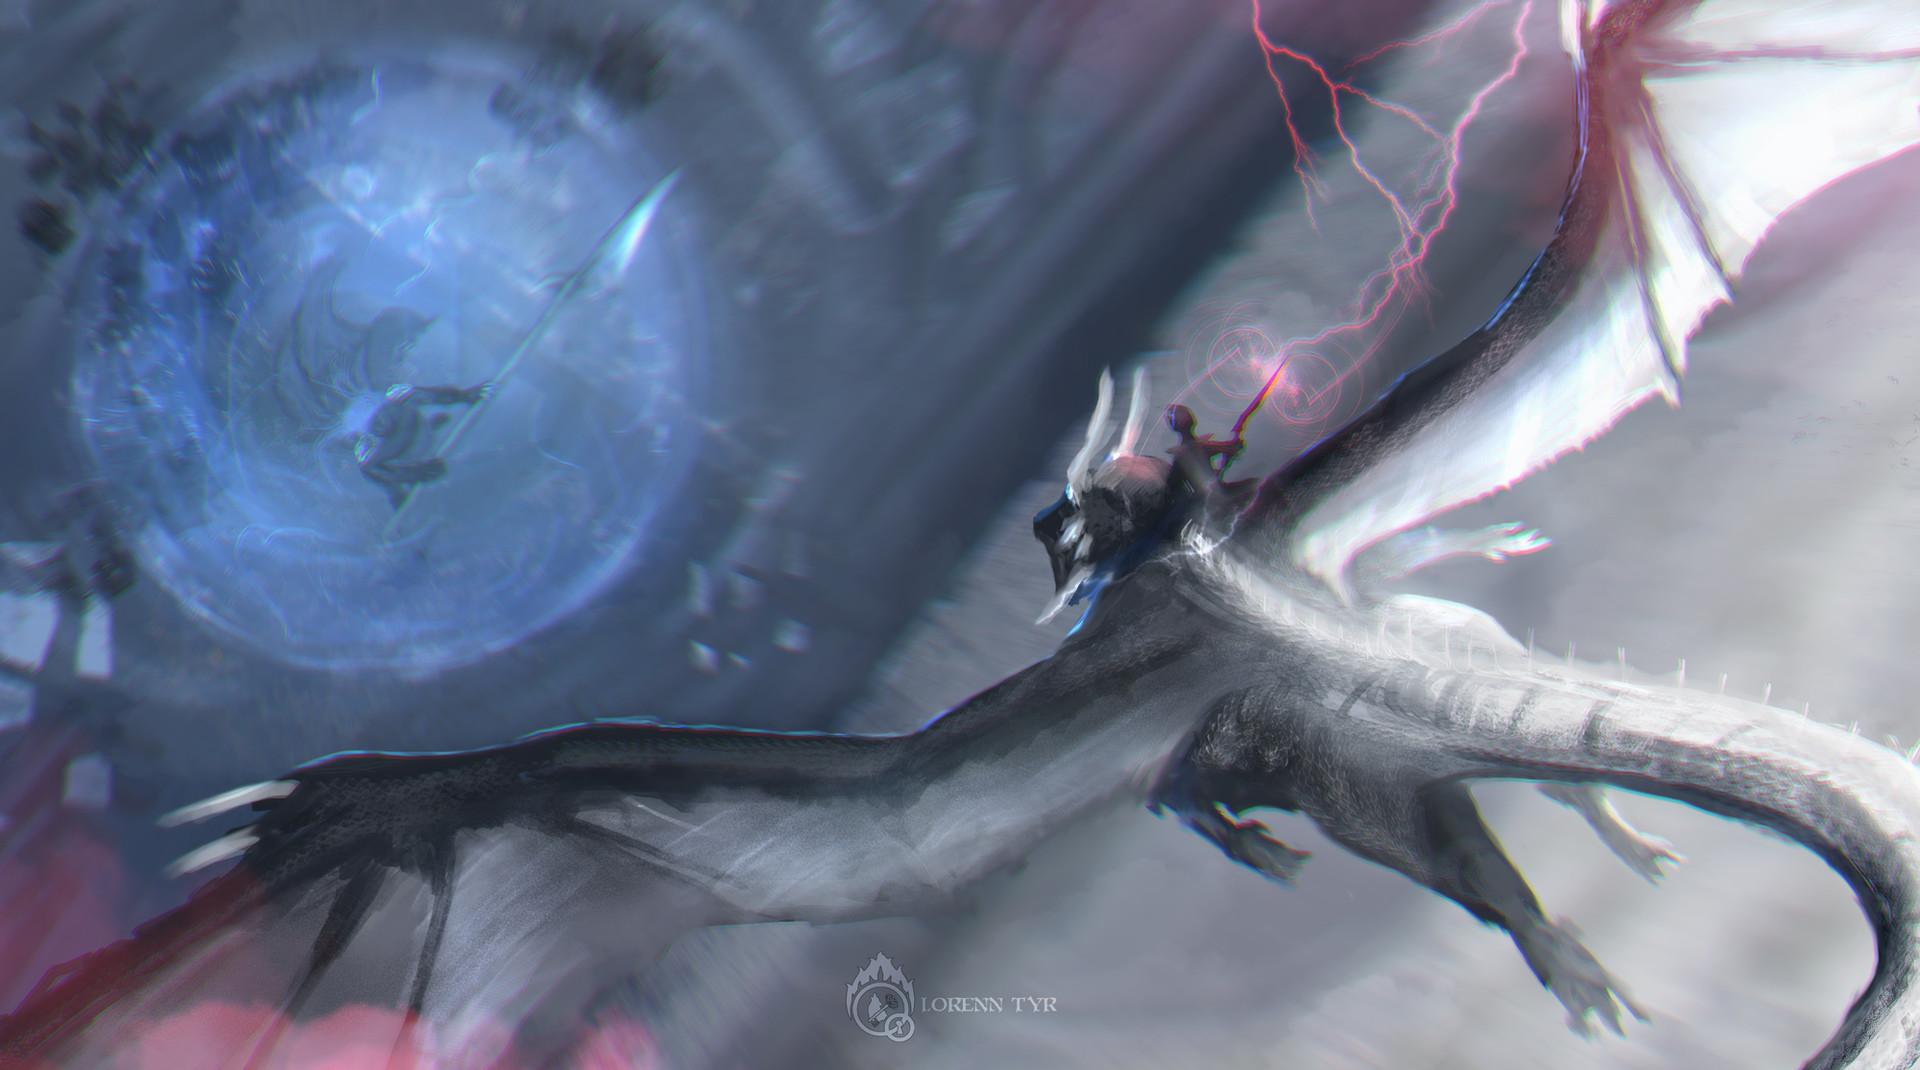 Lorenn tyr caida de dragon3